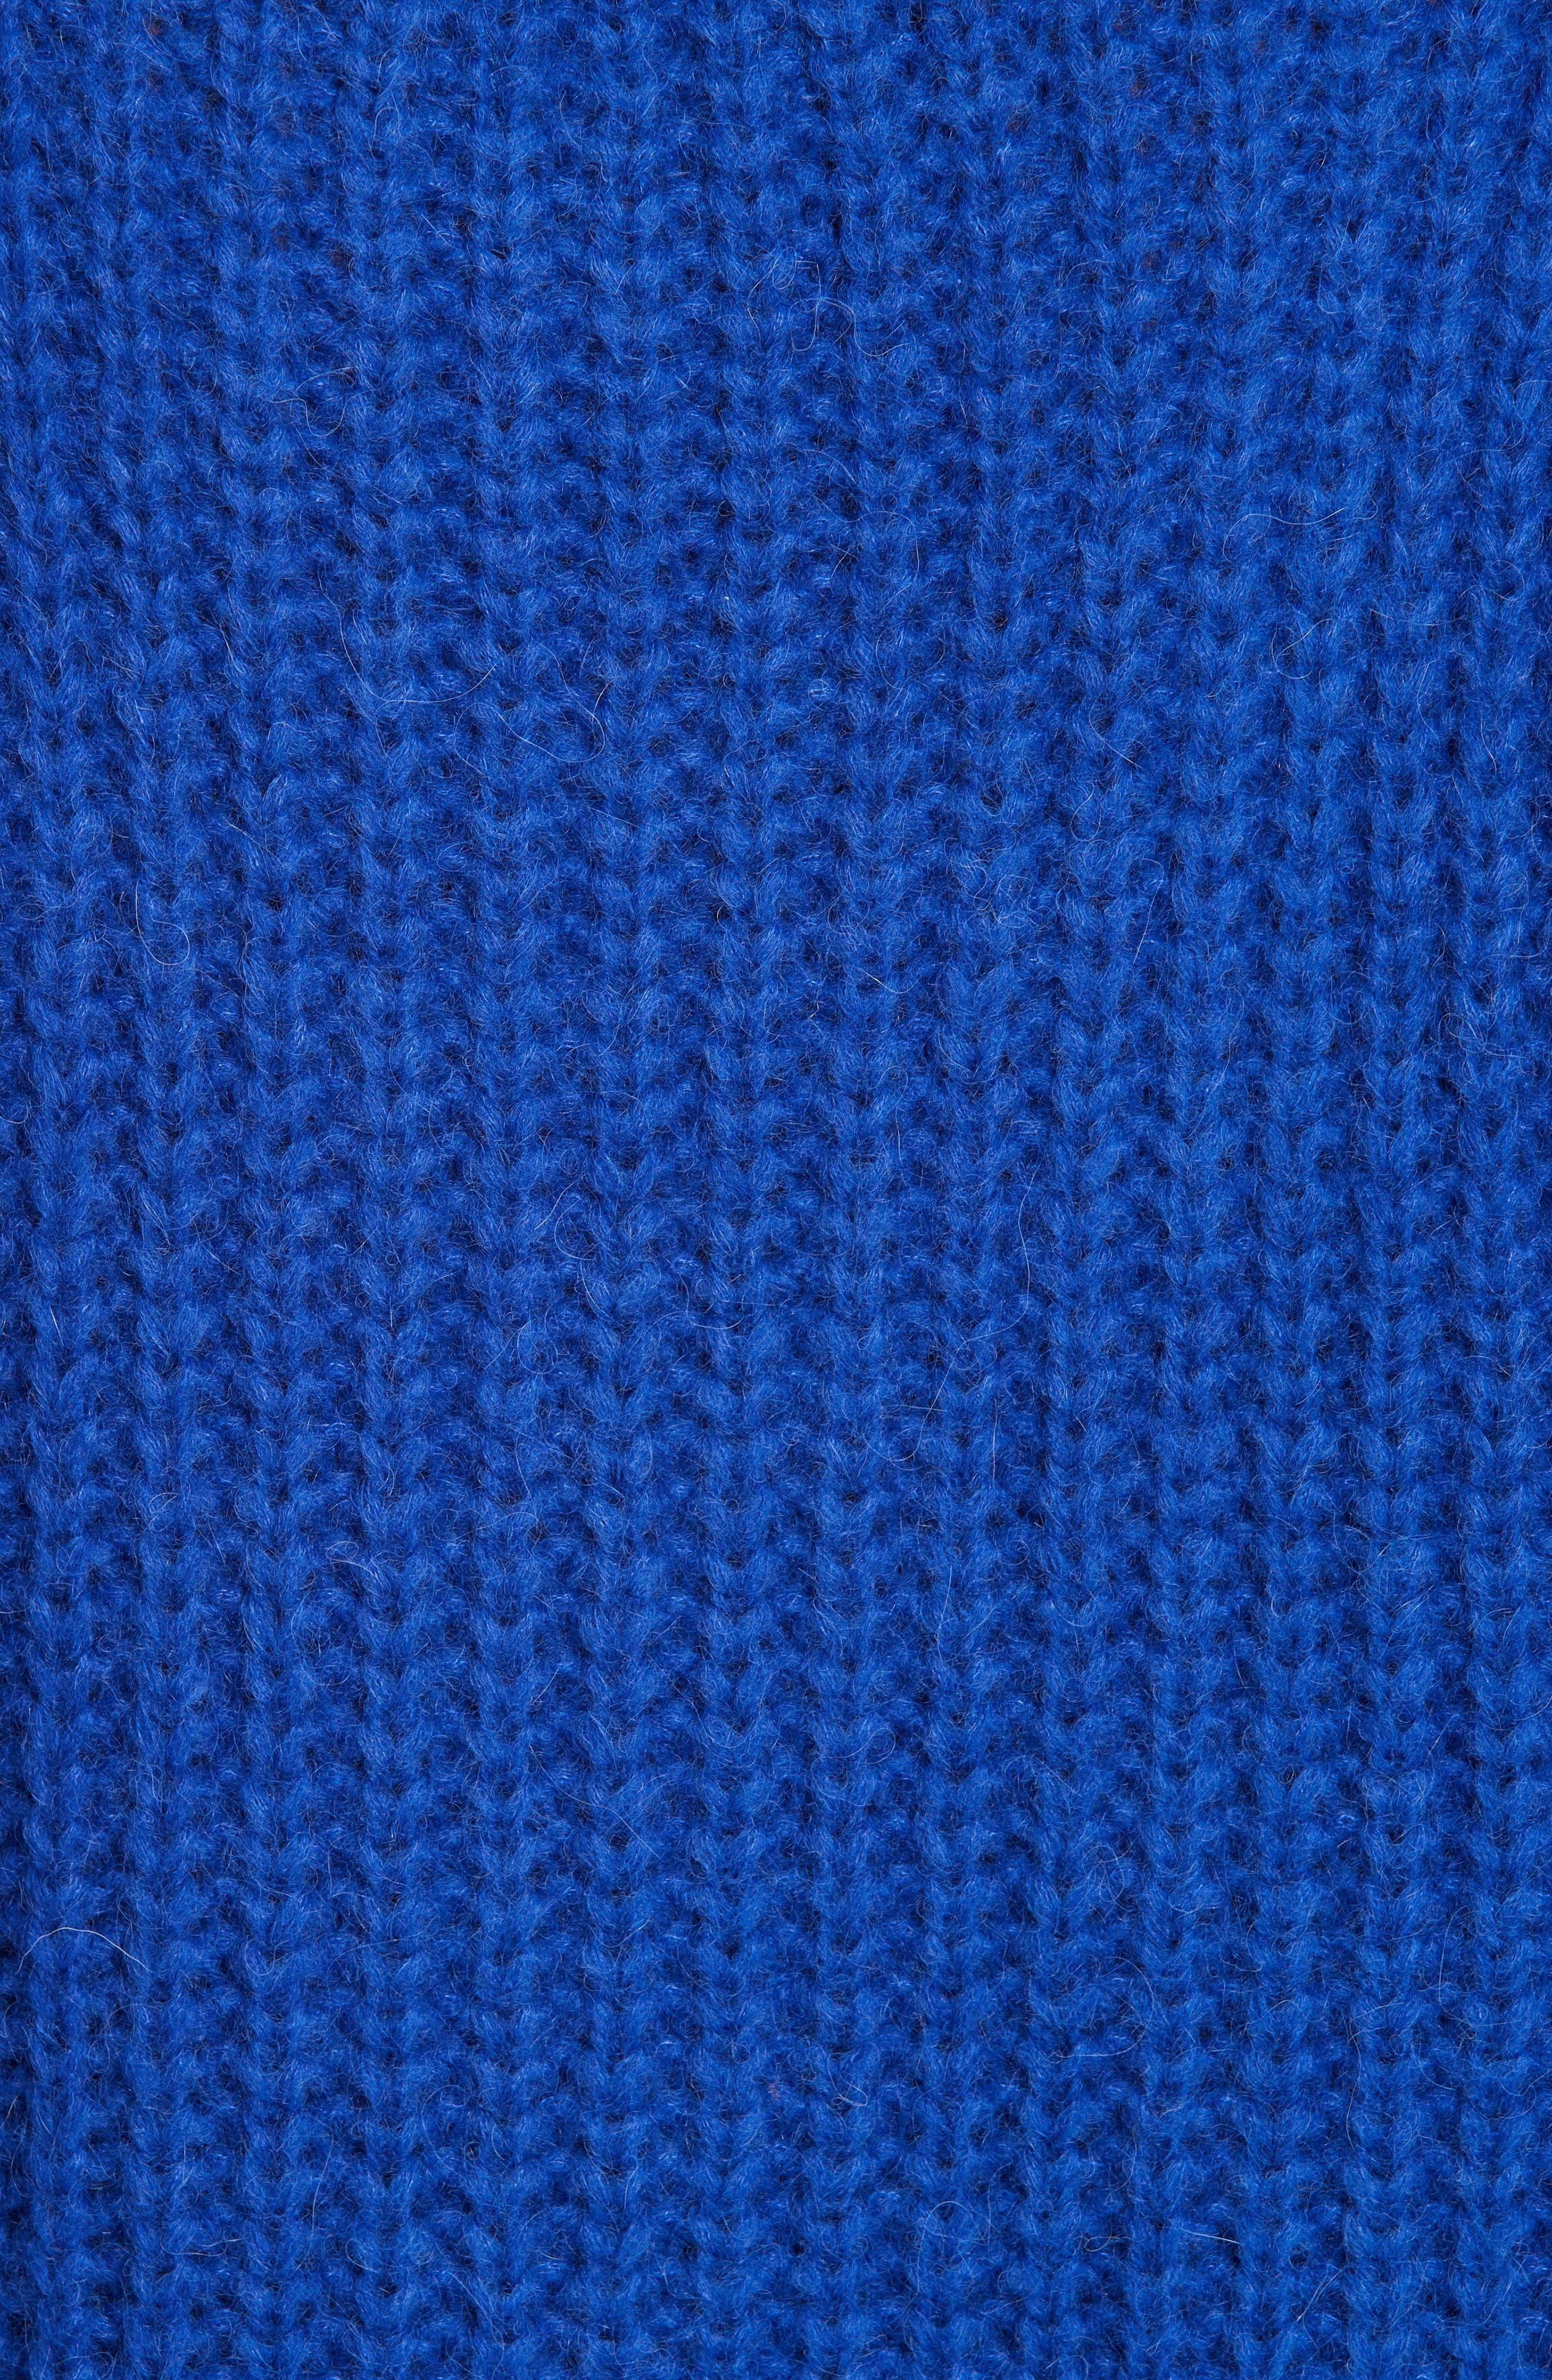 Emera Turtleneck Sweater,                             Alternate thumbnail 5, color,                             BLUE